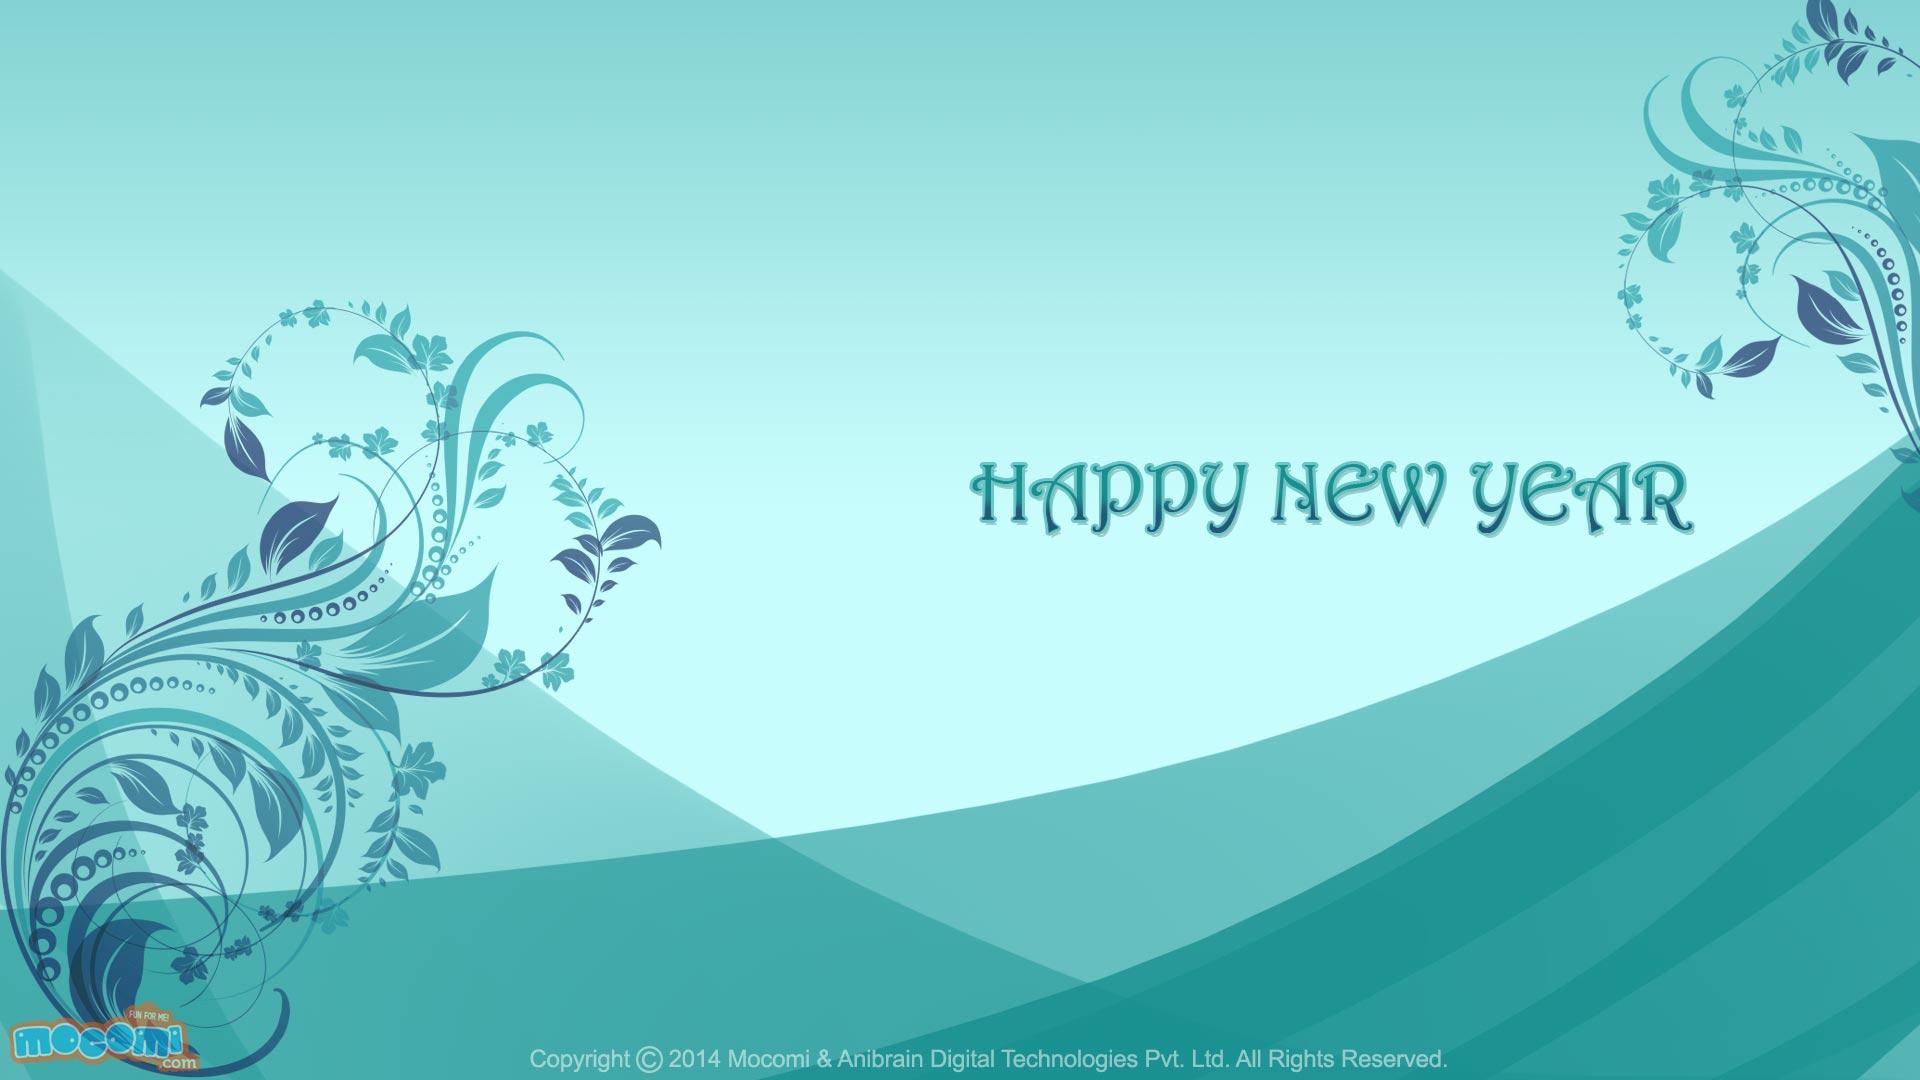 Happy New Year Wallpaper- 2